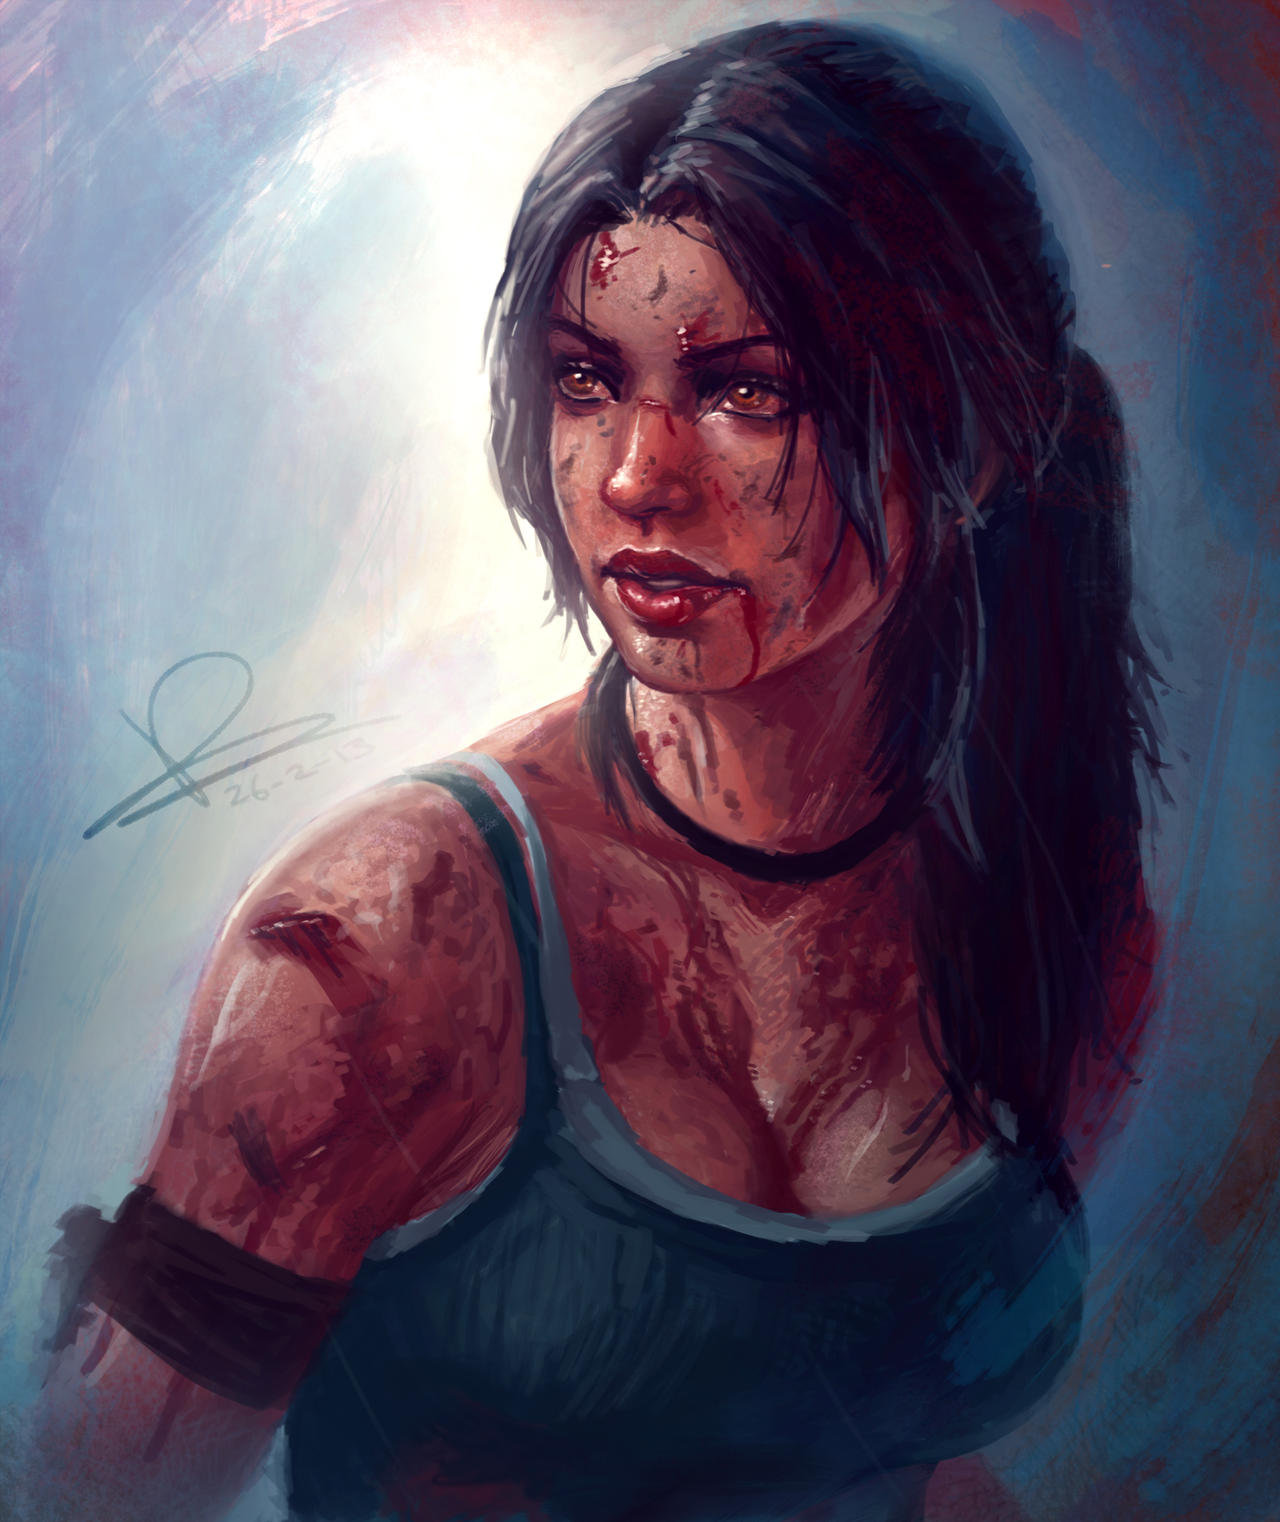 New Tomb Raider Wallpaper: Tomb Raider Reborn By TsunamiXD On DeviantArt